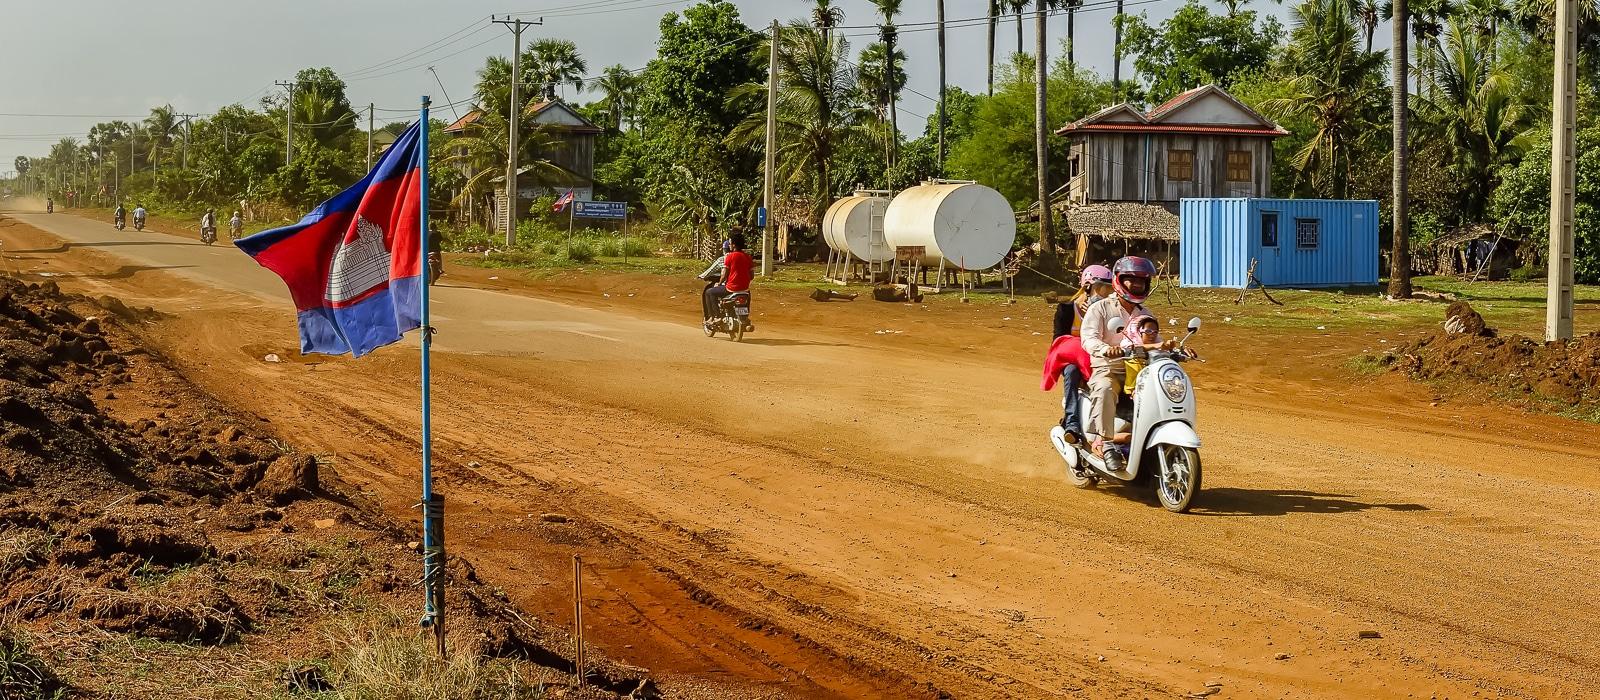 thumb - Cambodge-1600x700-13.jpg